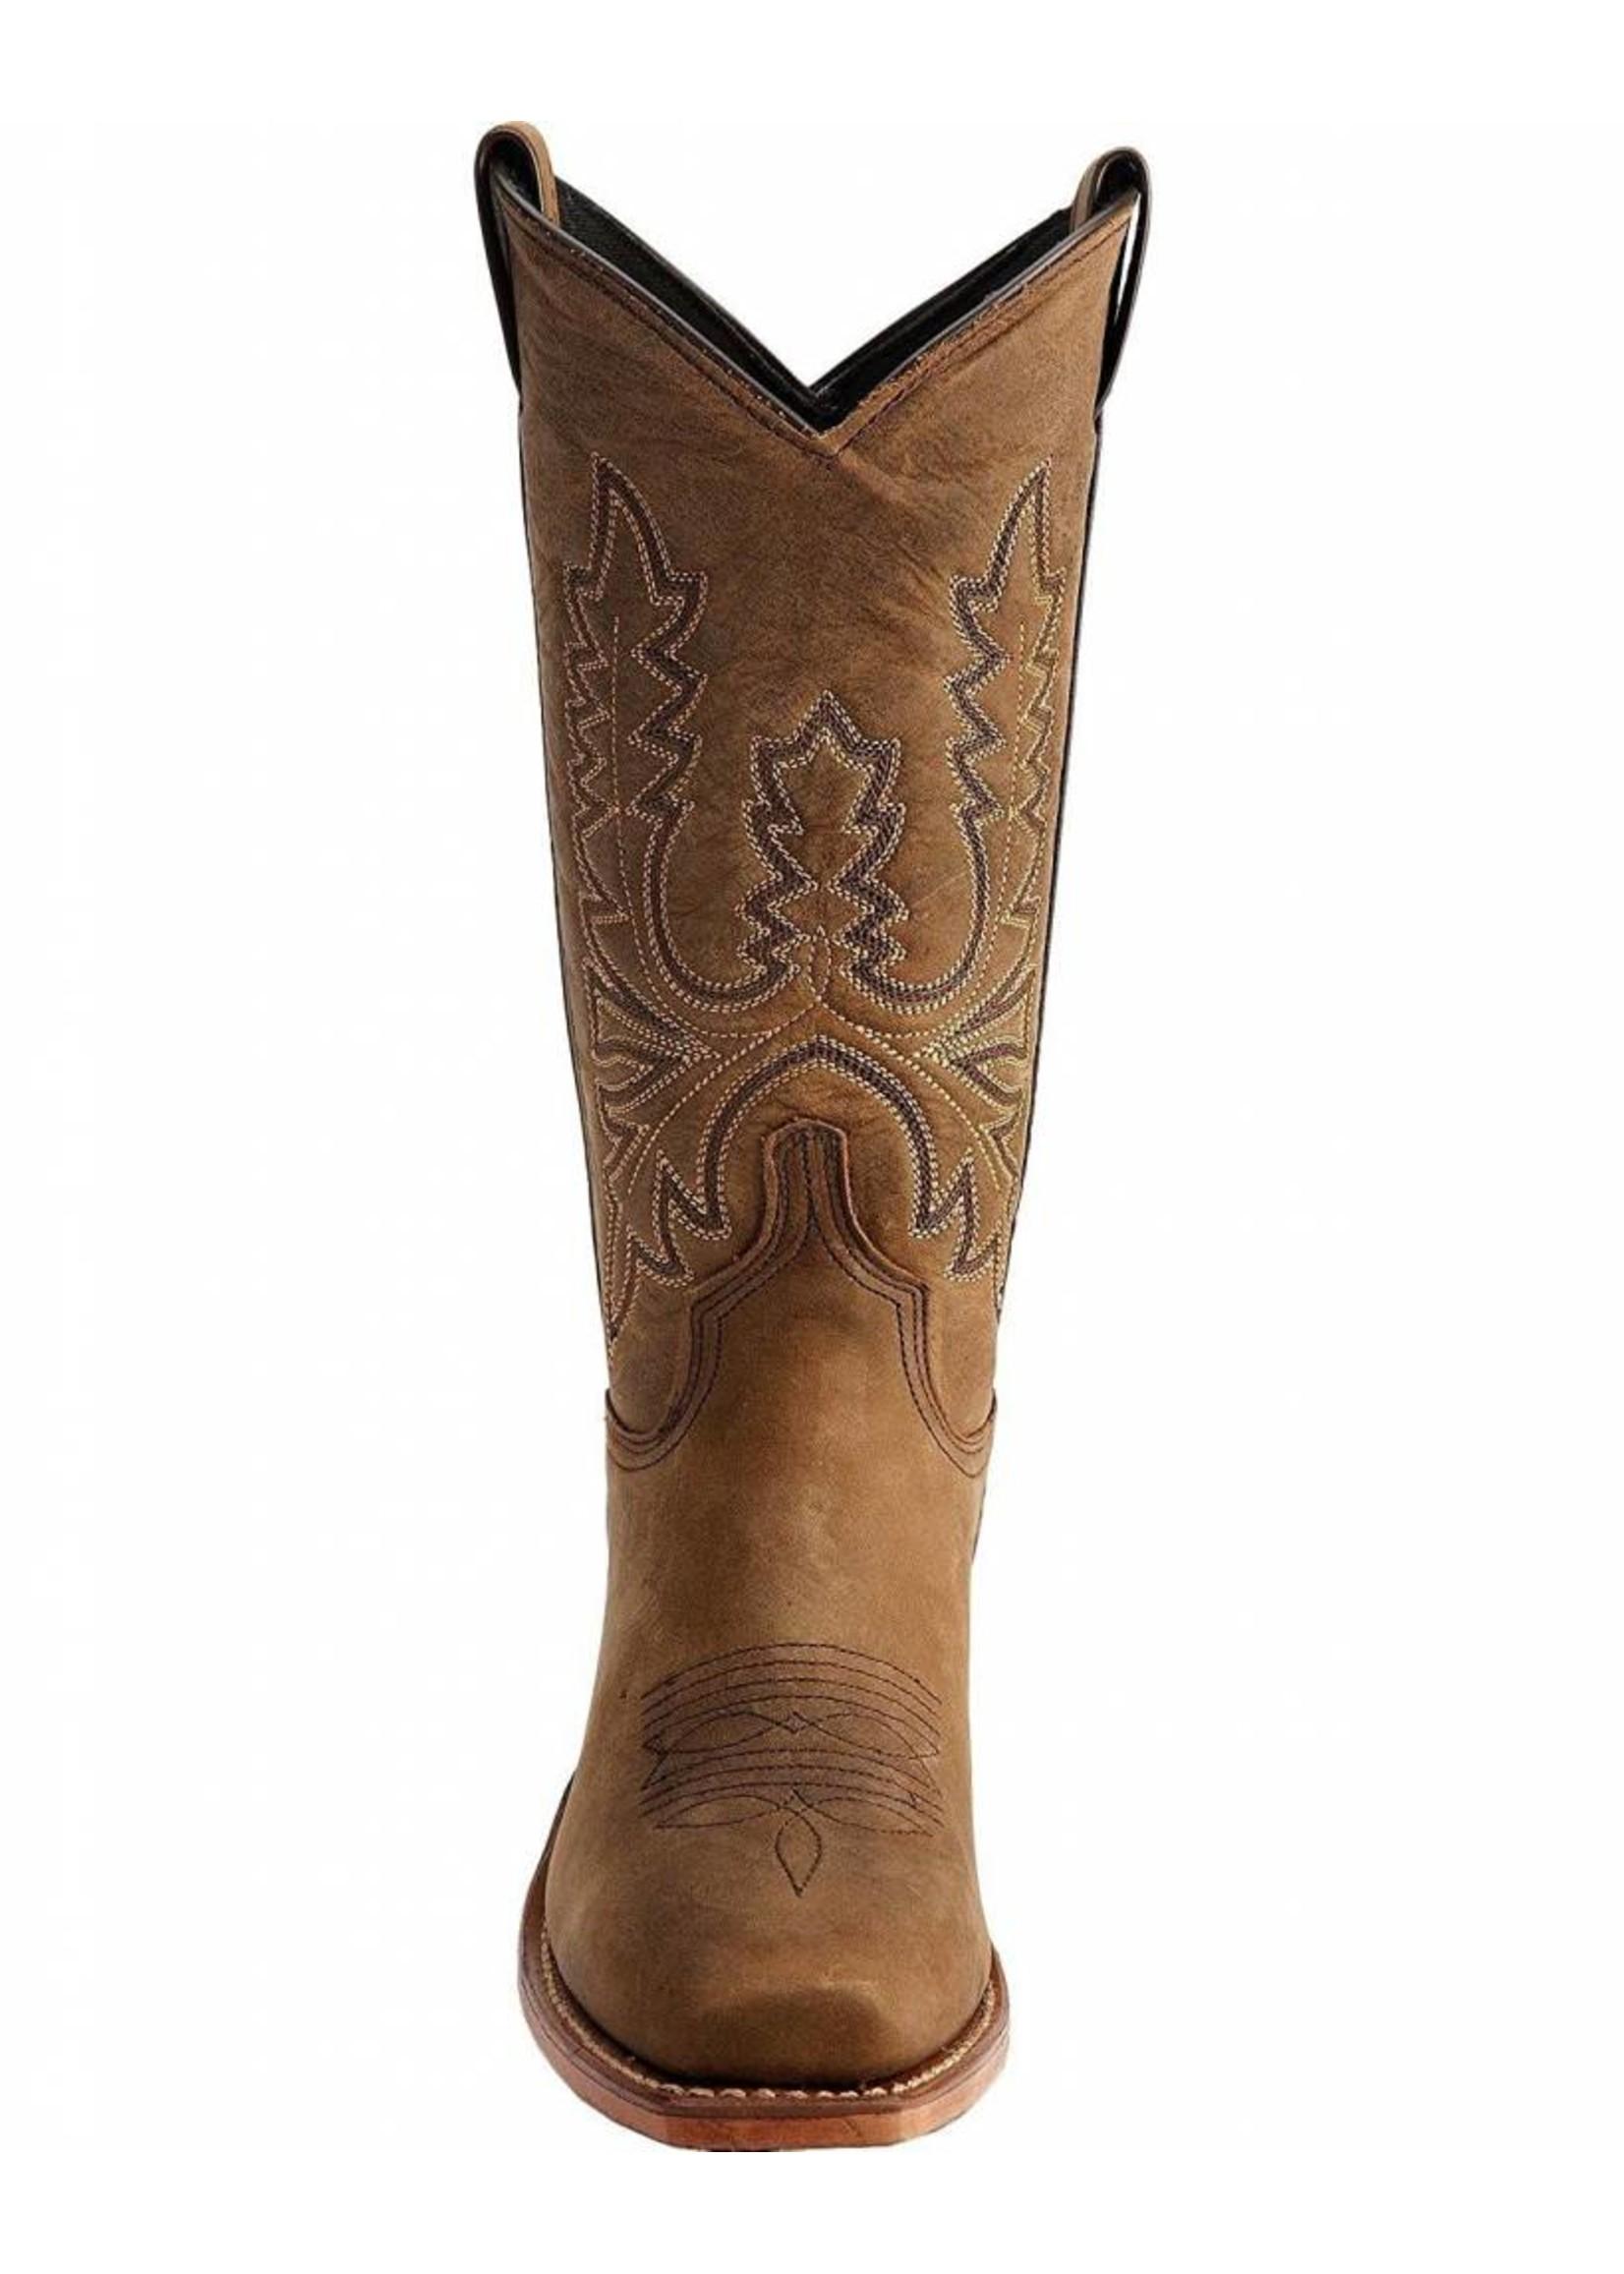 Abilene Women's Oiled Cowhide Cowgirl Boot Square Toe - 9011